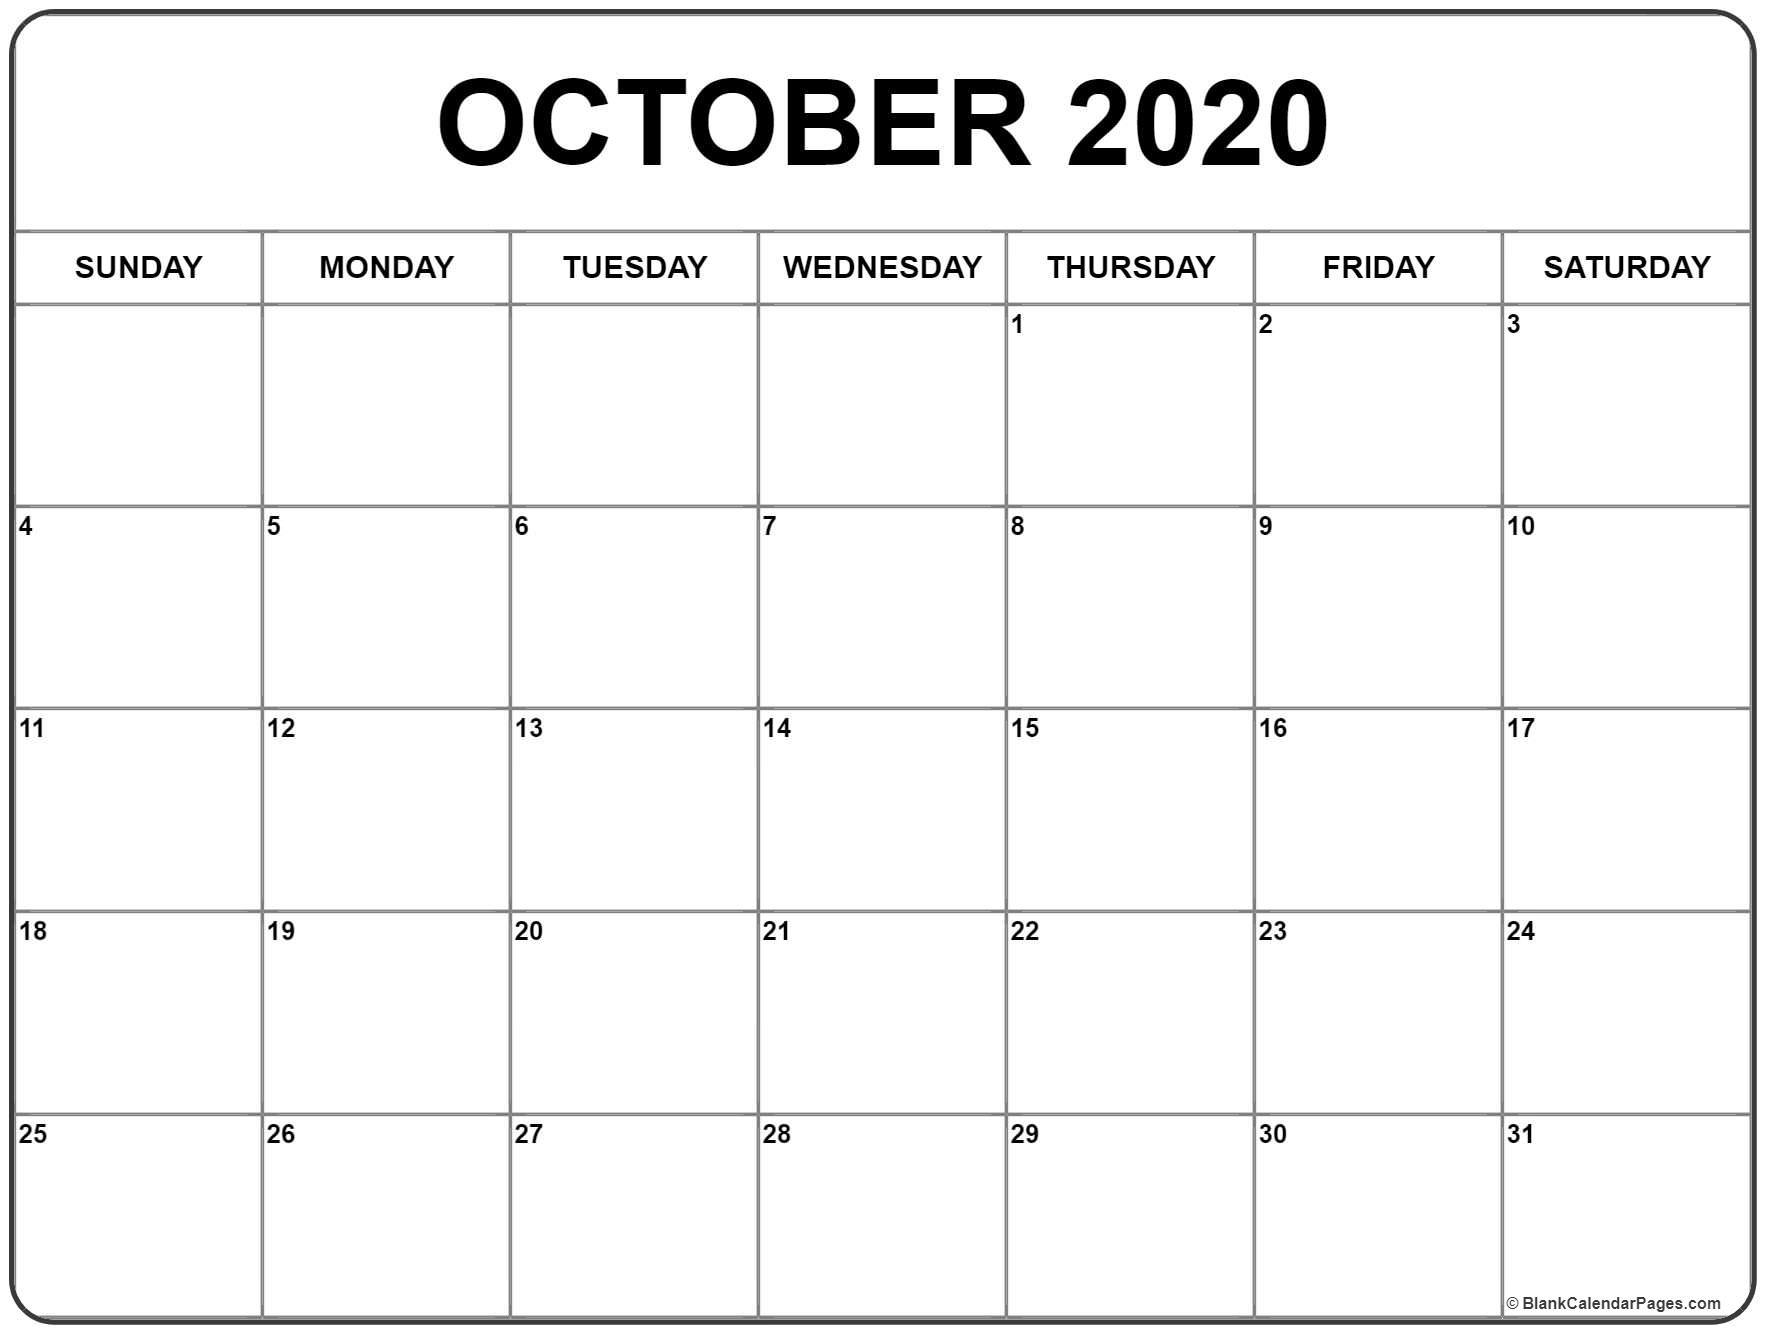 October 2020 Calendar | Free Printable Monthly Calendars_Blank Calendar For October 2020